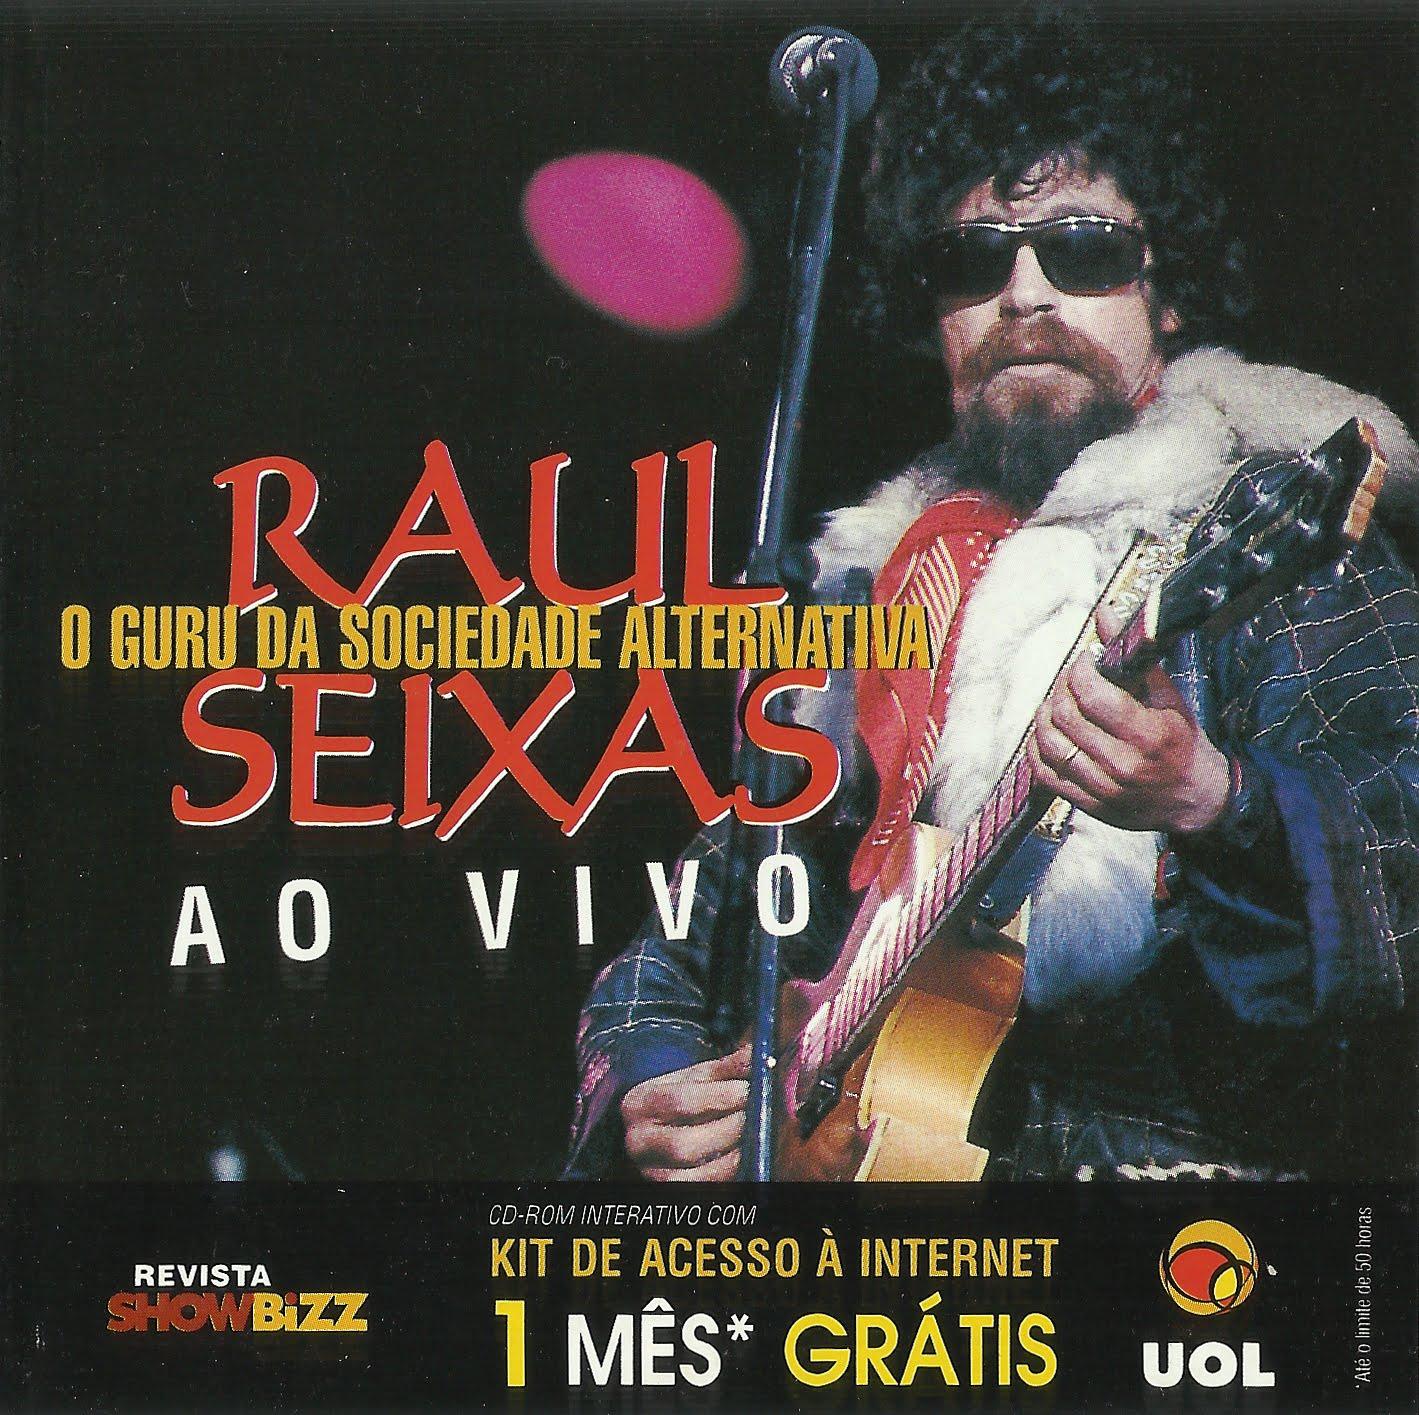 RAUL DOWNLOAD GITA CD GRÁTIS SEIXAS